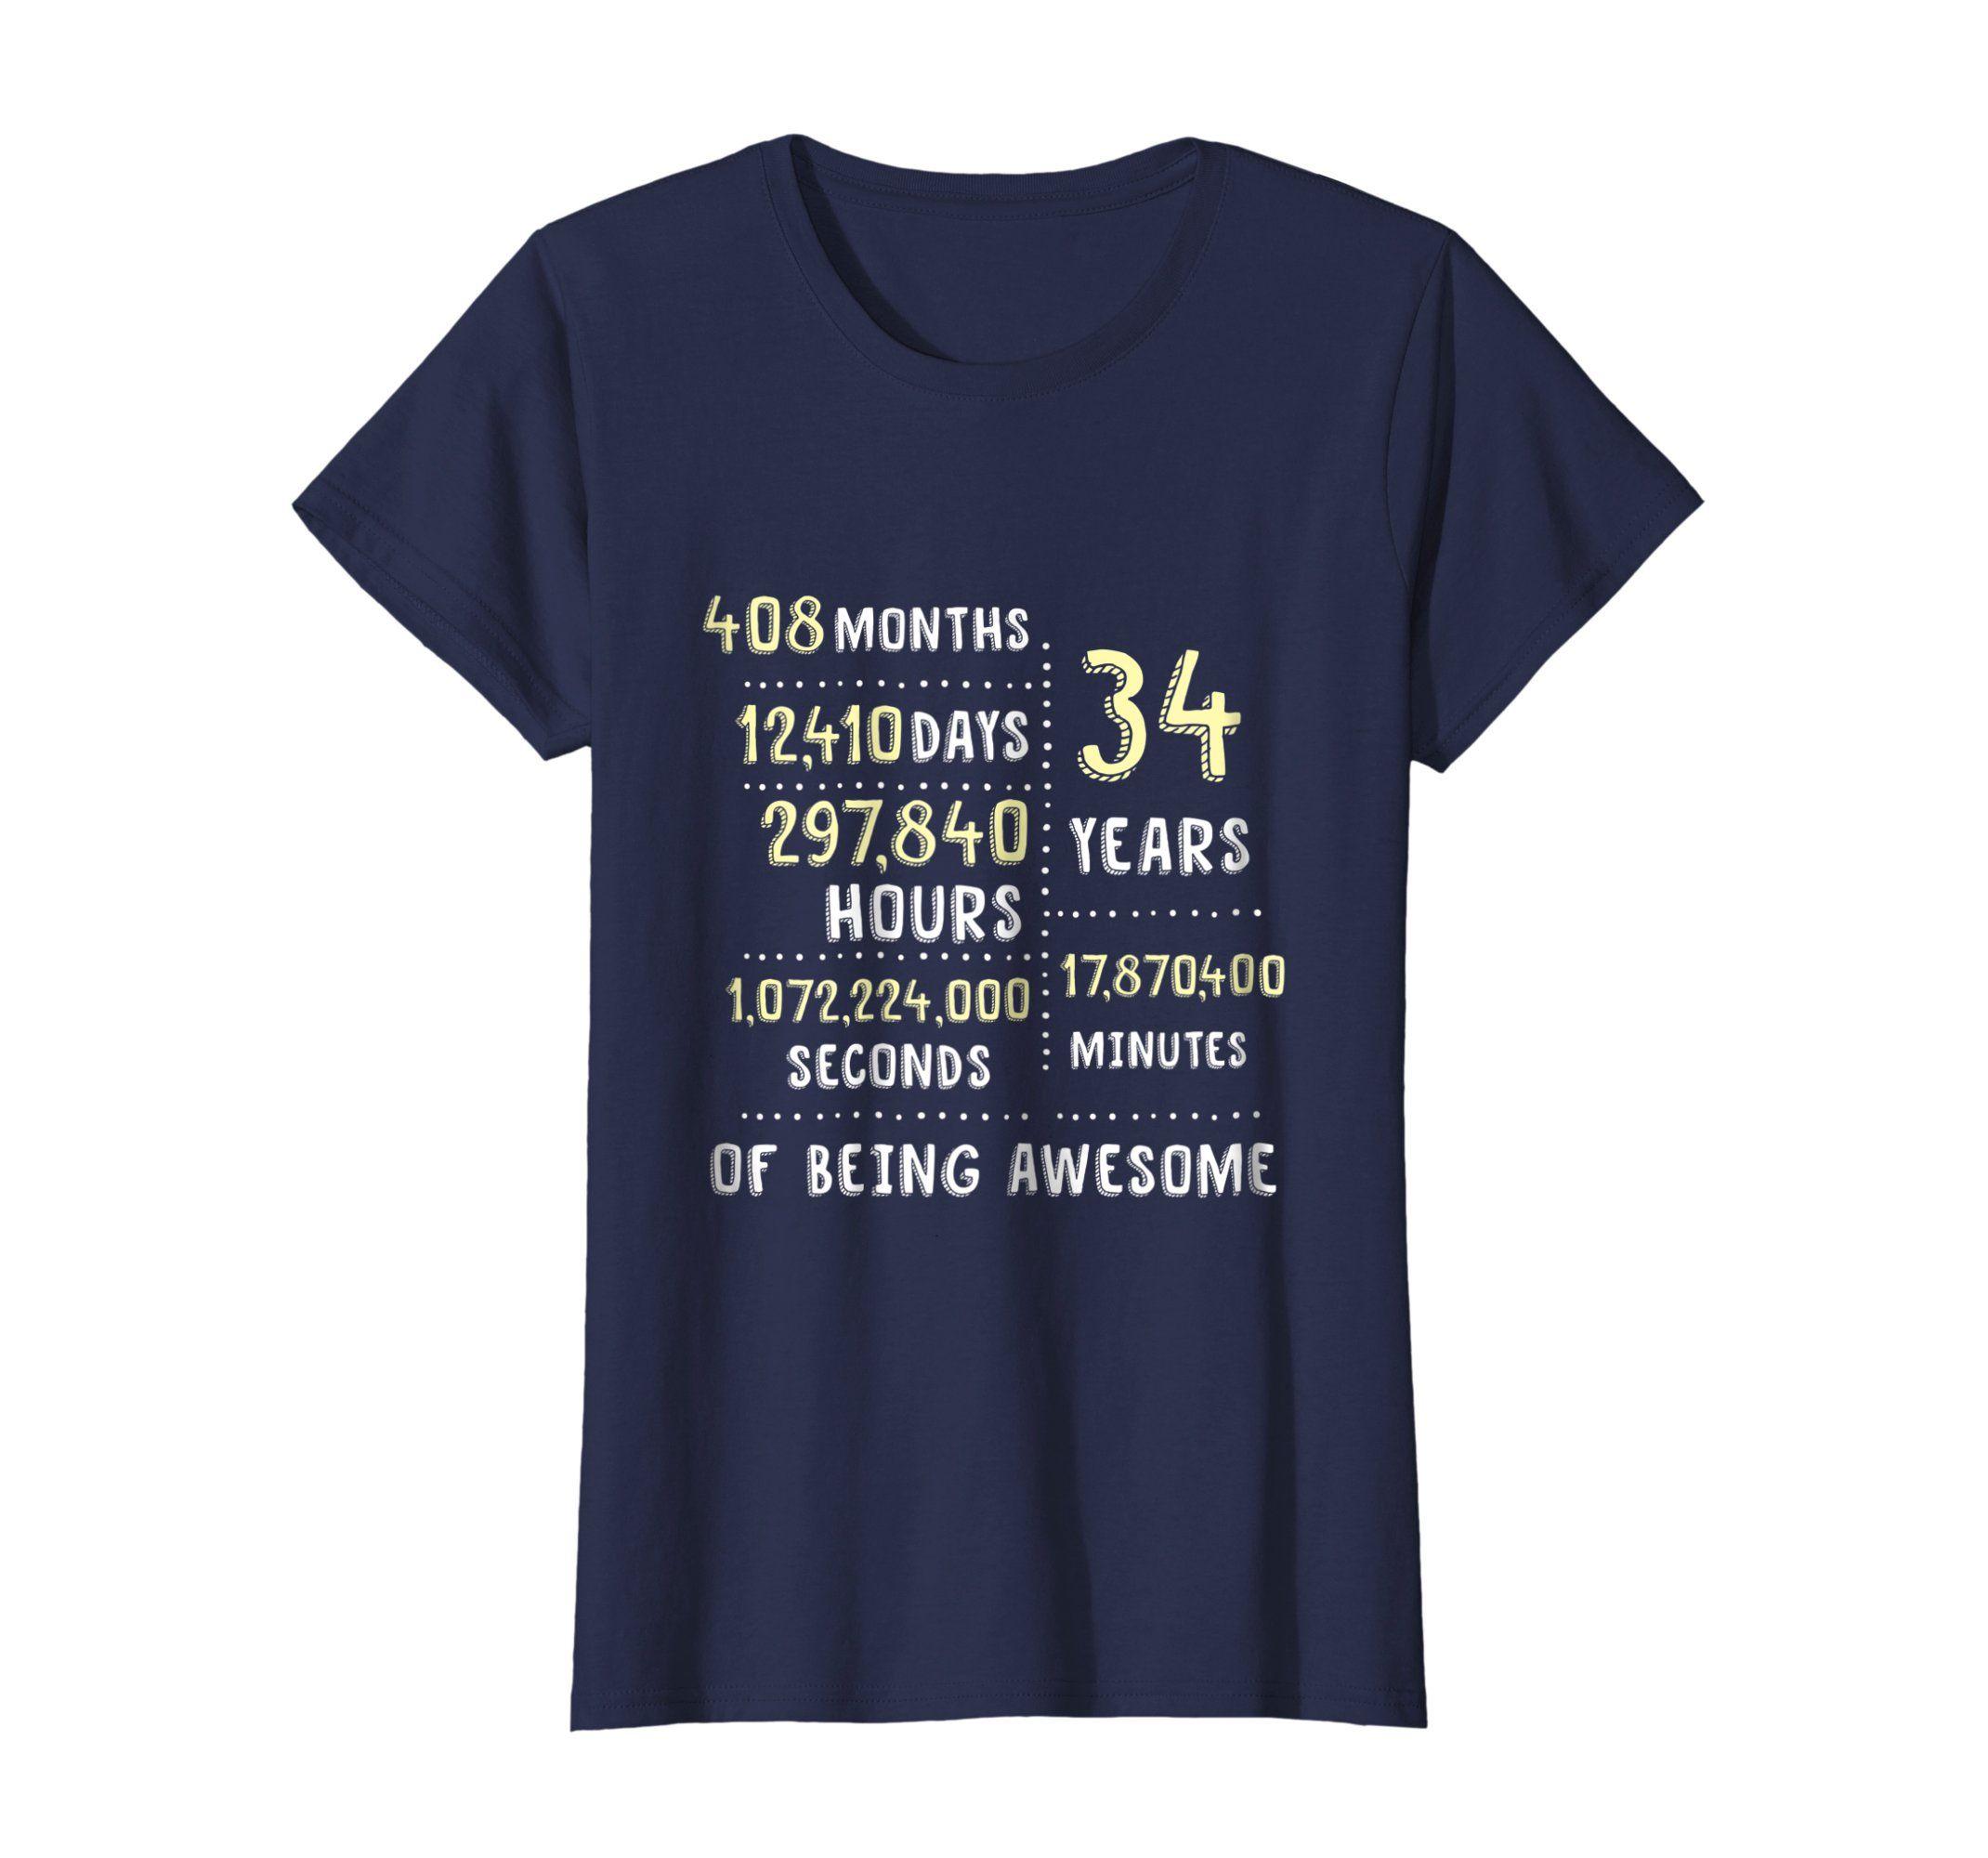 Gift for 34th Birthday for Women 34th Birthday tshirt Sassy Classy Fabulous 34 Sassy 34th Birthday Gift for Women 34th Birthday Gift